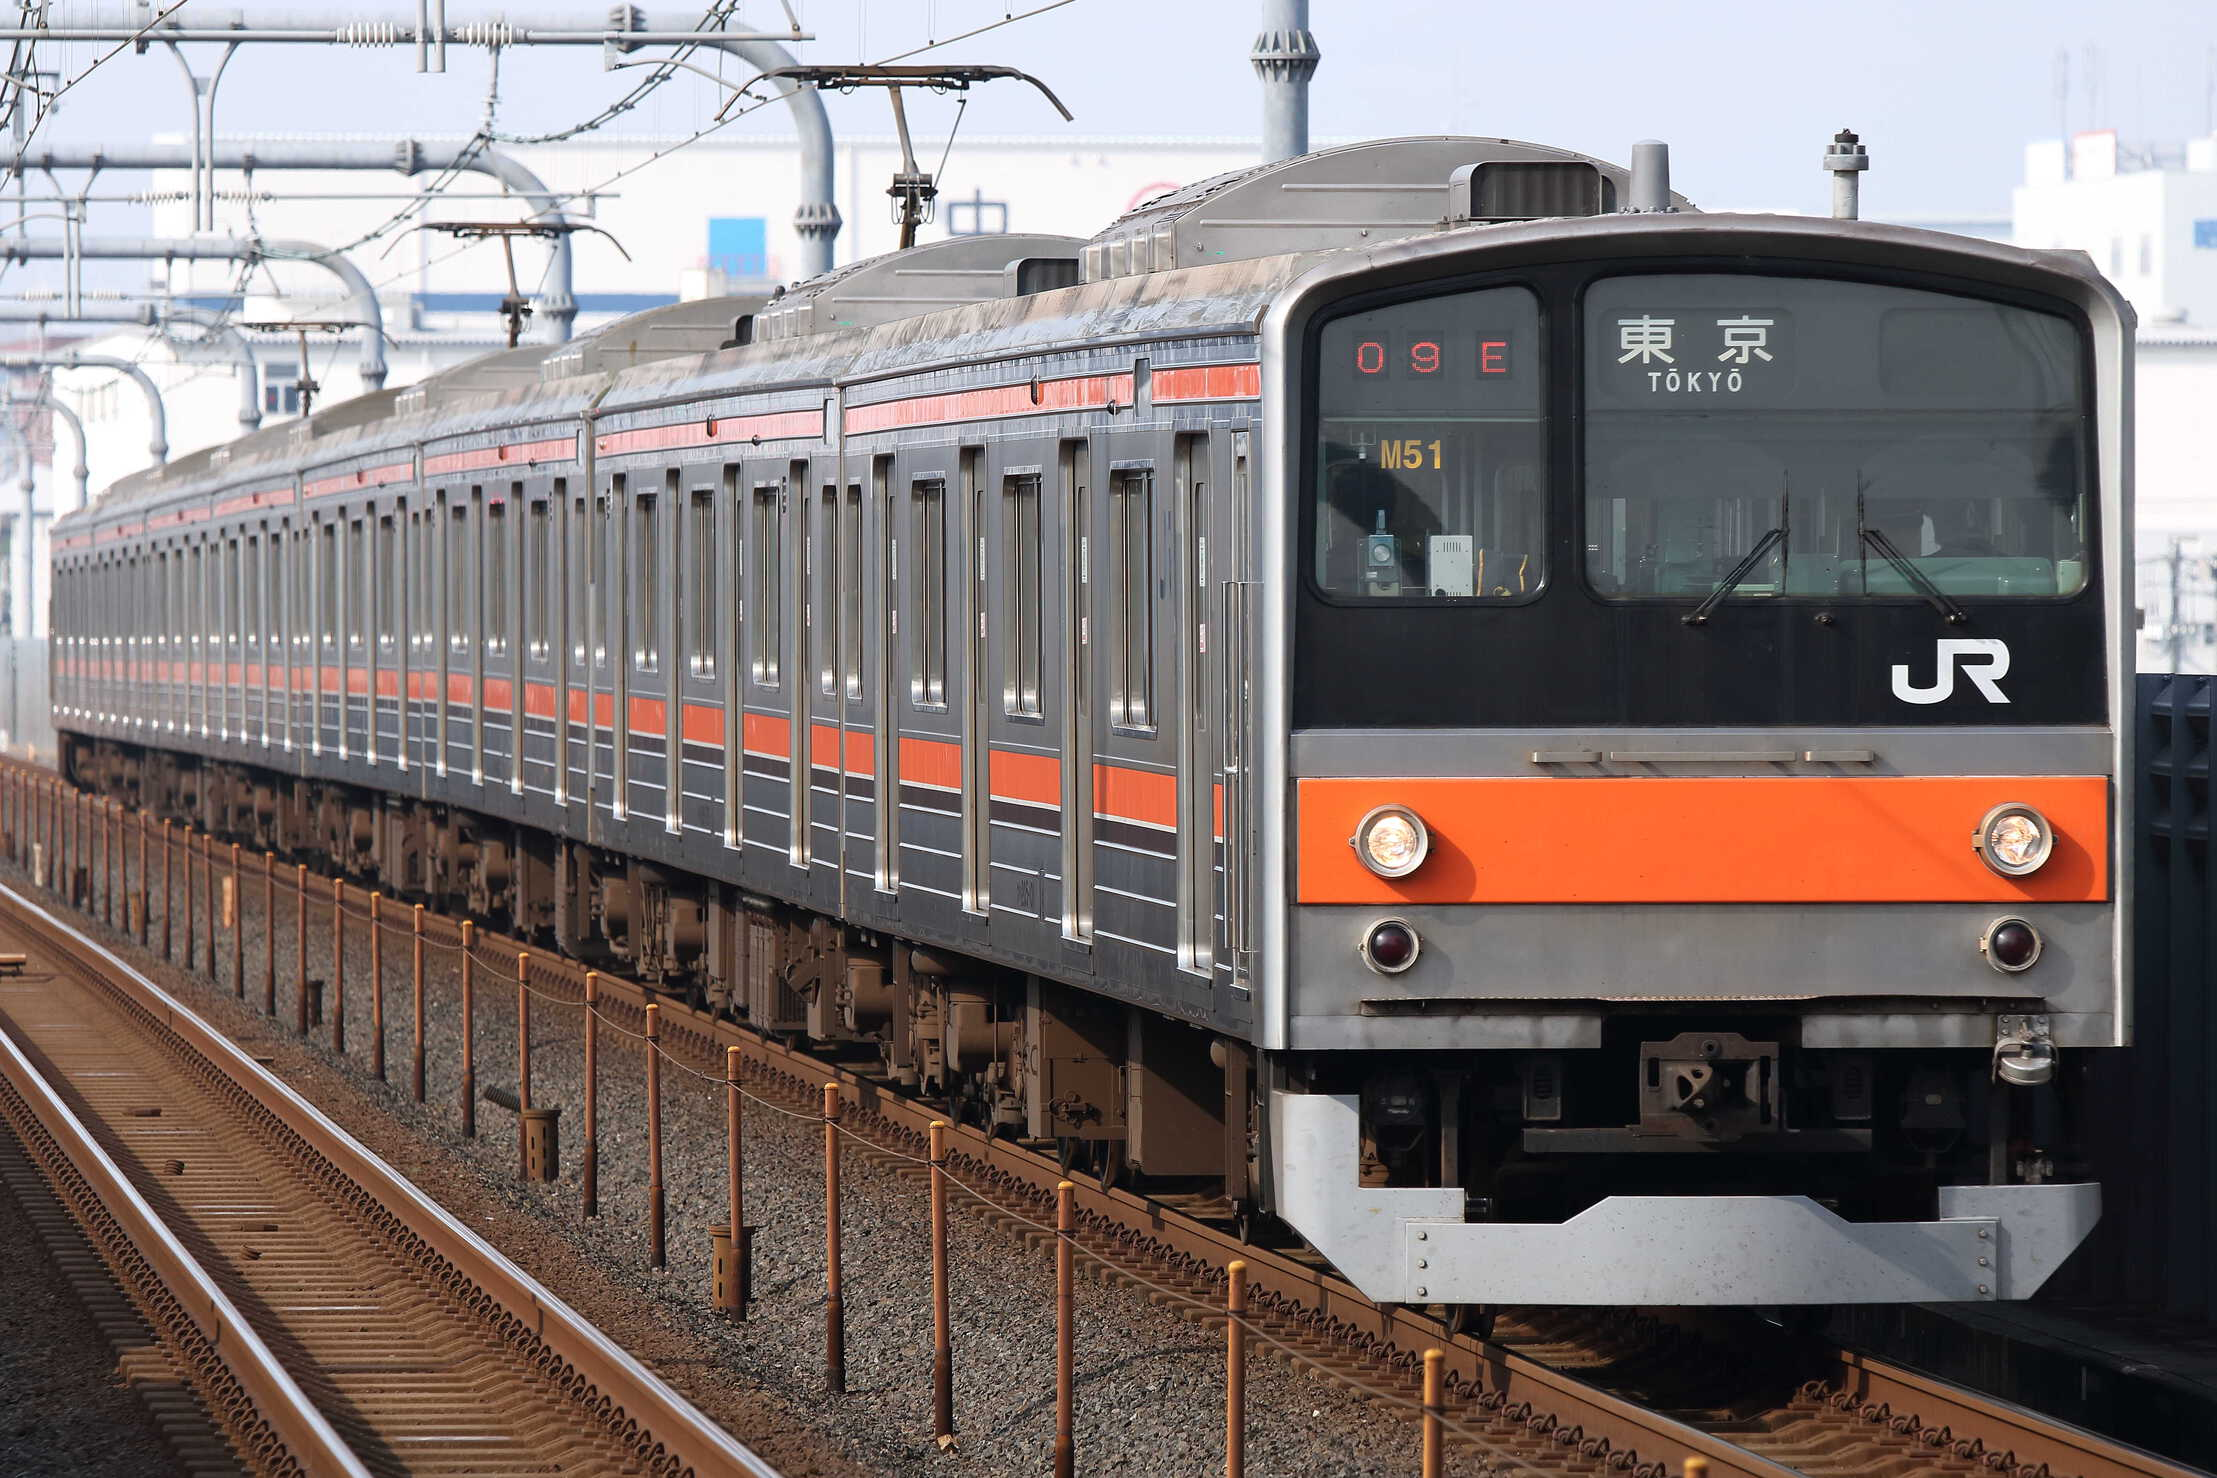 809E 205系 千ケヨM51編成